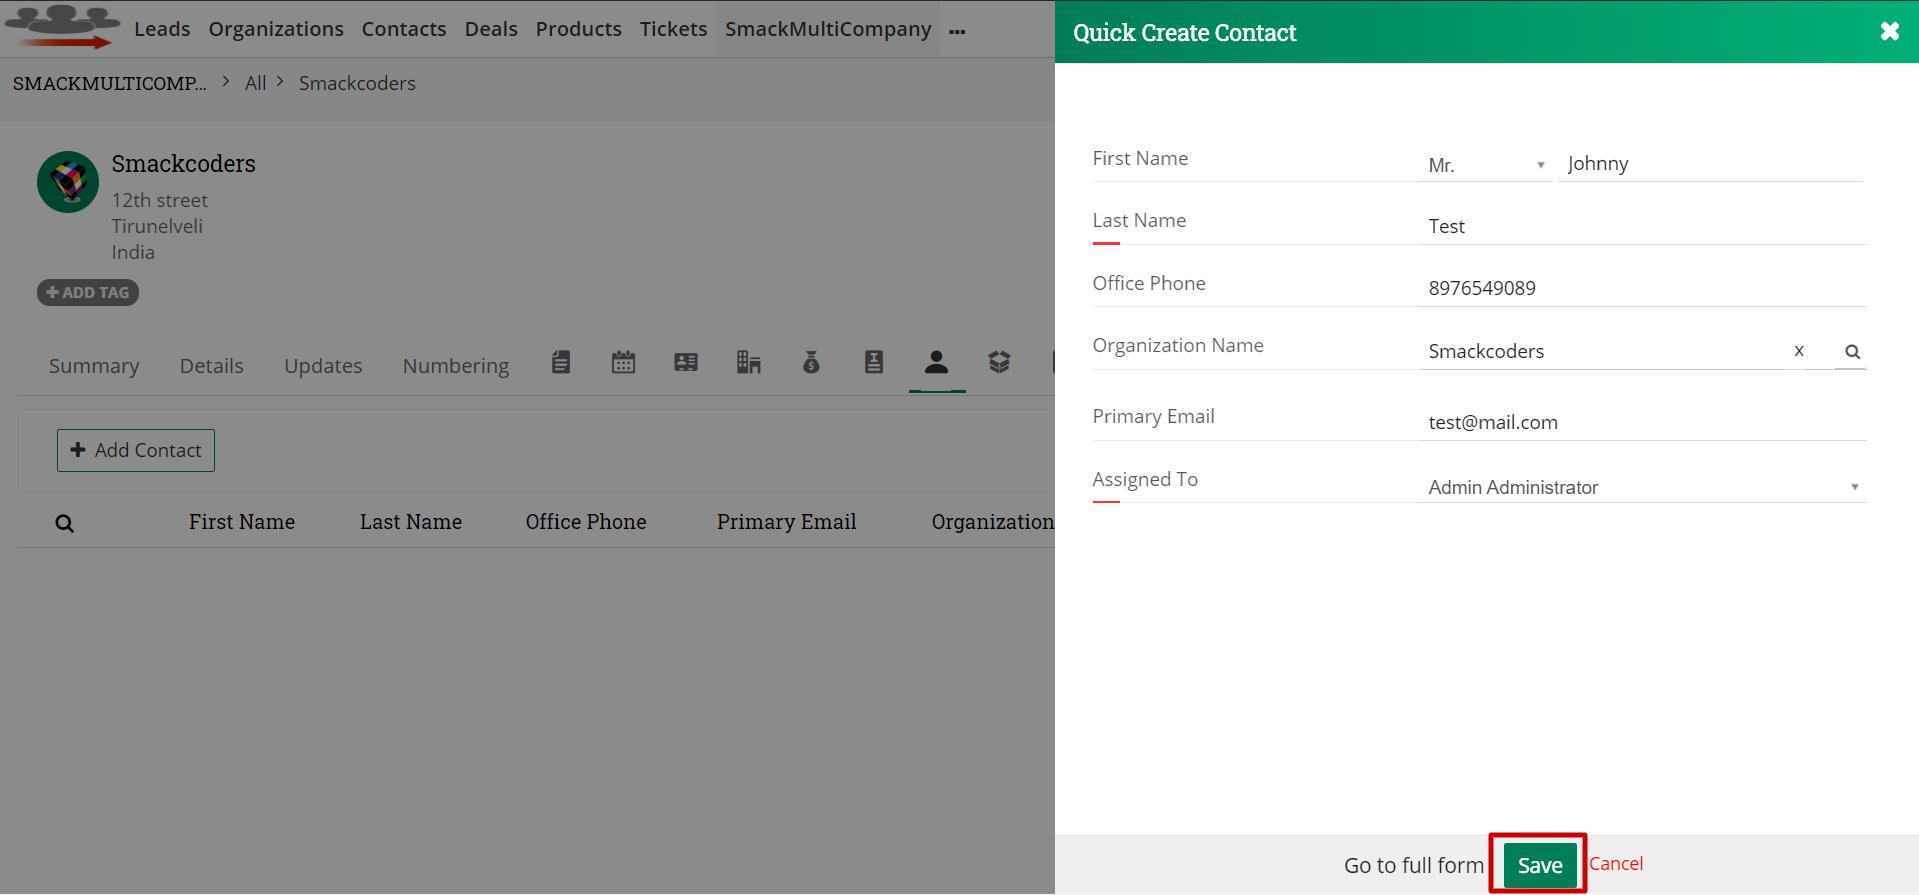 joforce_multi_company_quick_create_contact